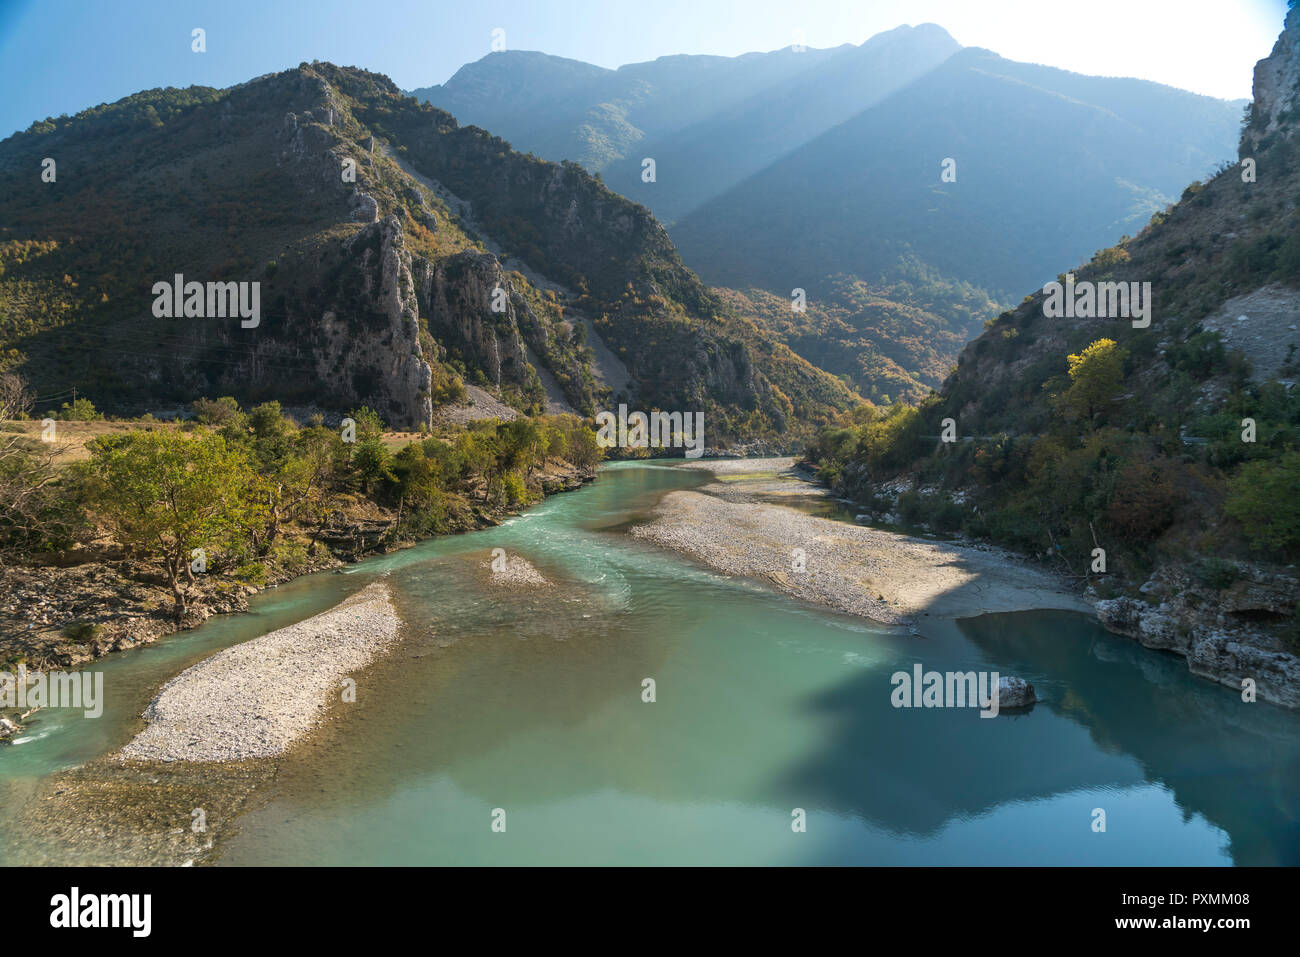 Landschaft am Fluss Drino, Albanien, Europa | landscape at Drino river, Albania, Europe - Stock Image